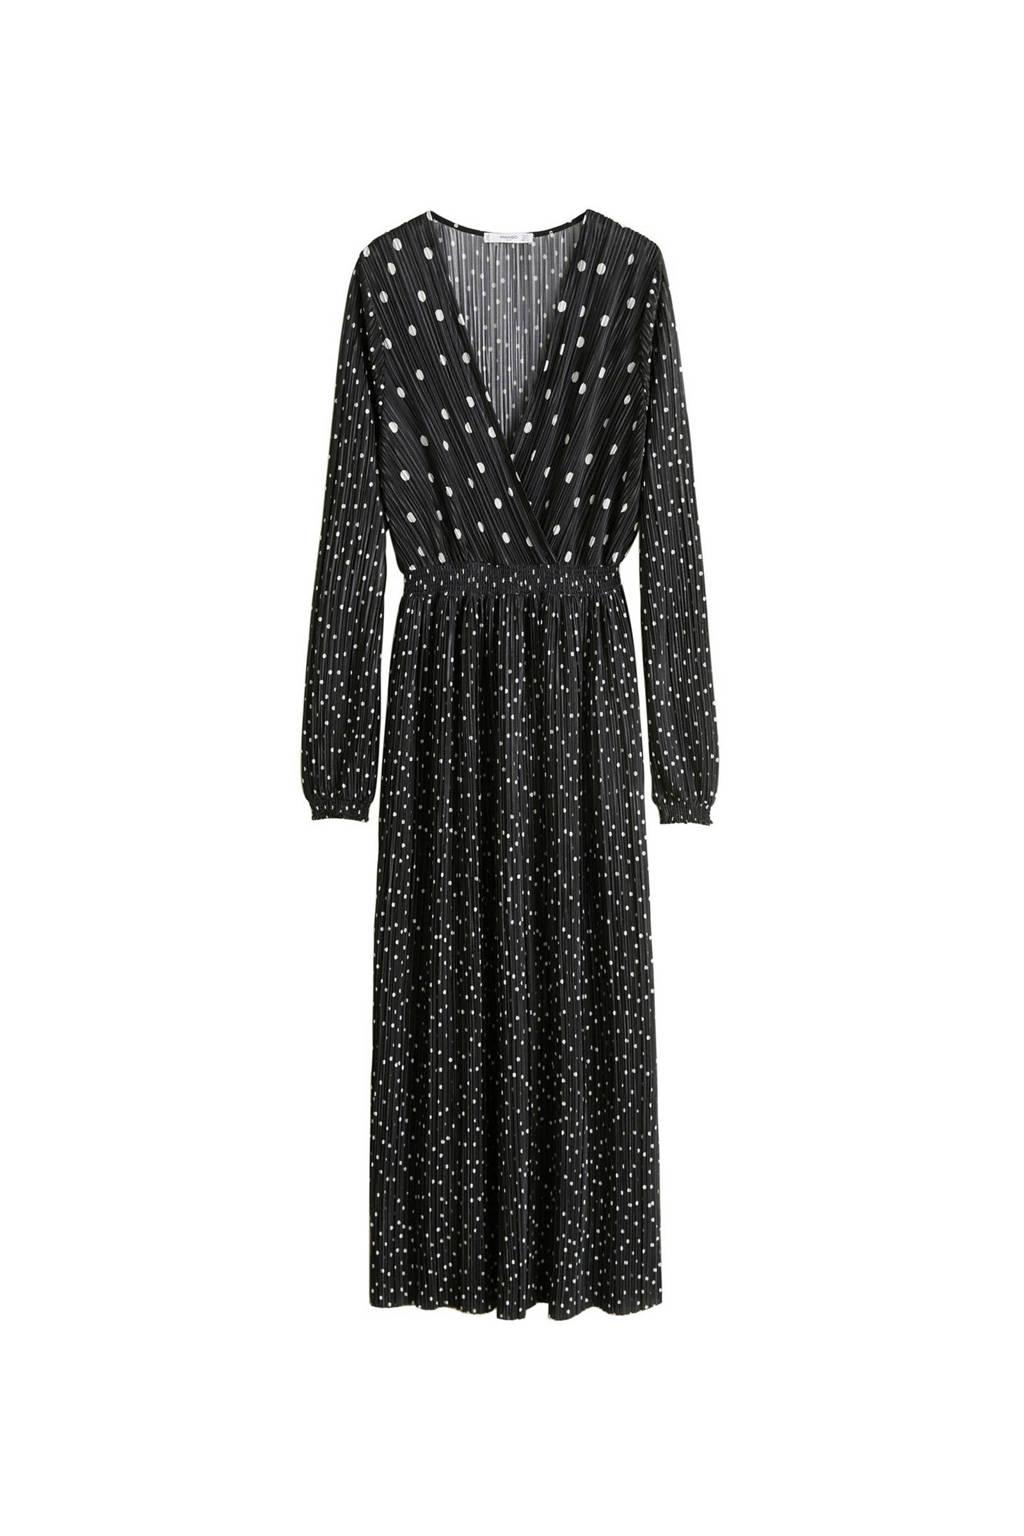 Mango jurk met stippen, Zwart/wit